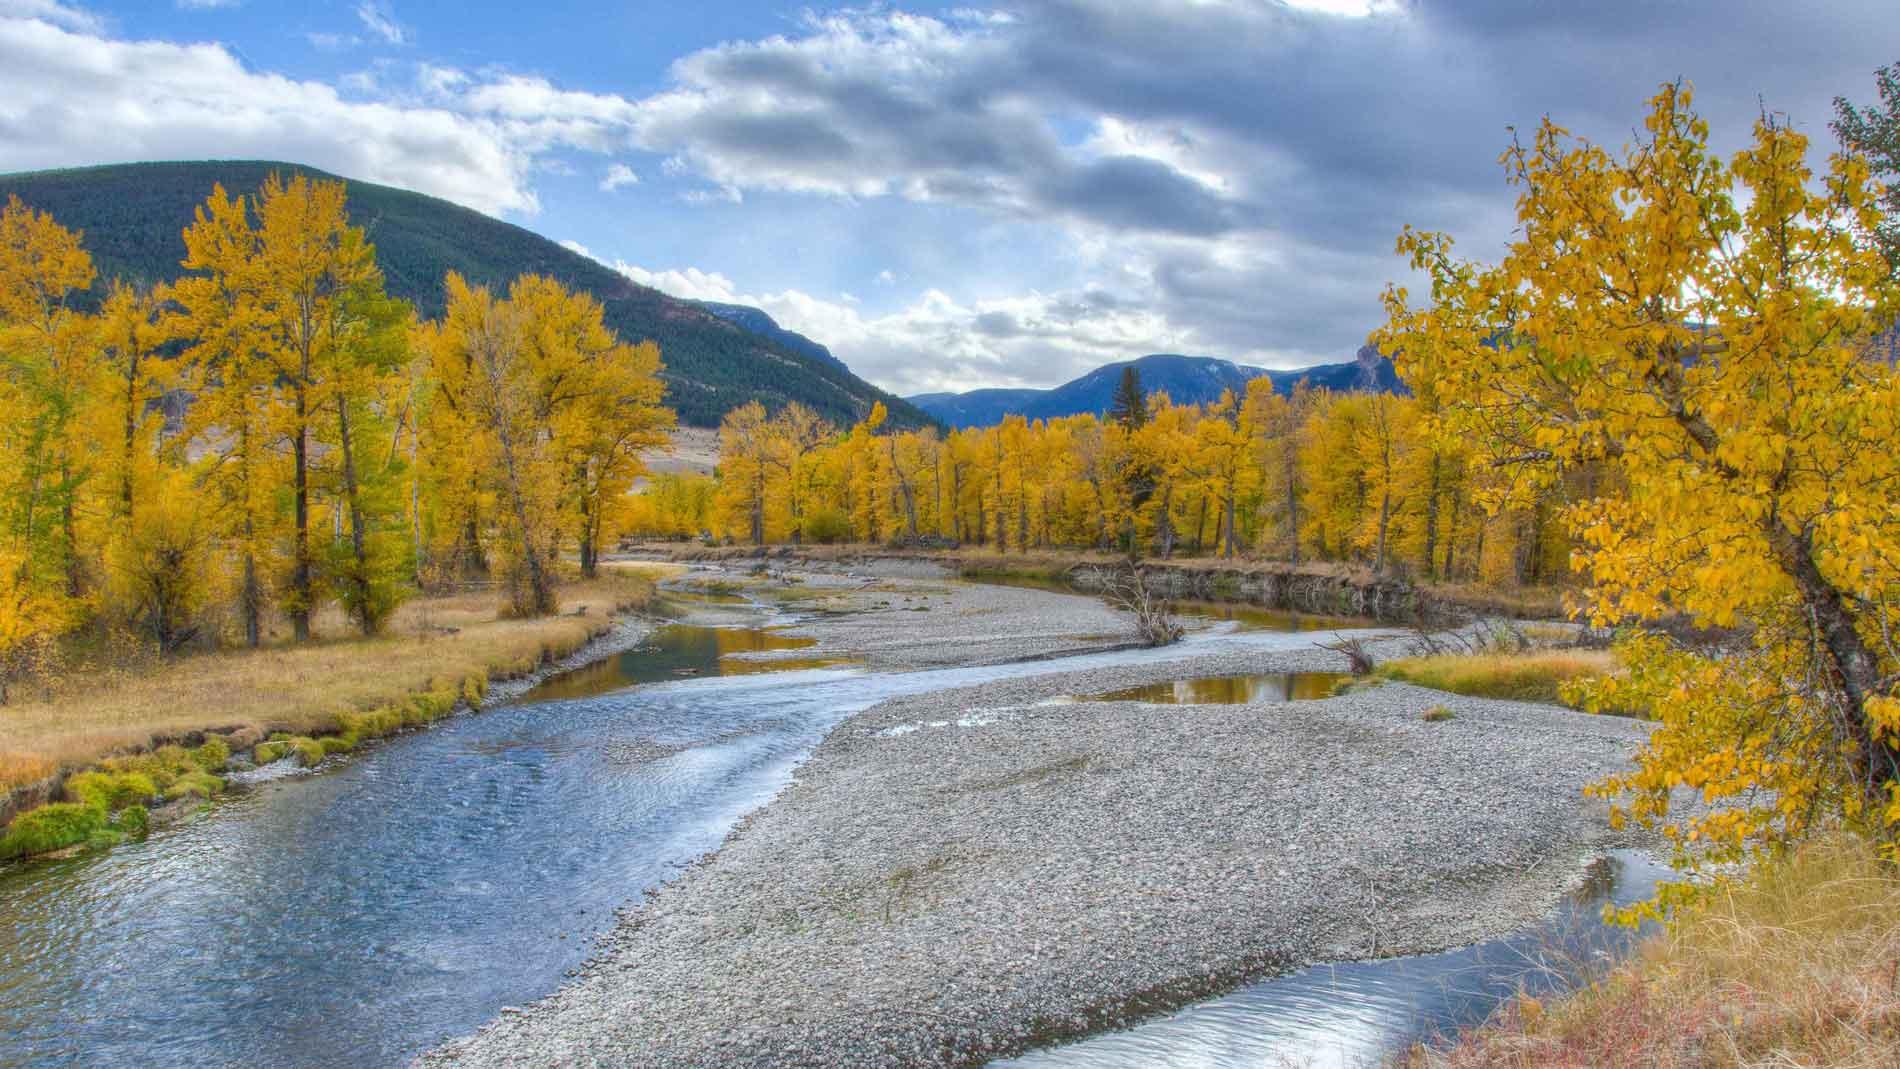 Boulder River, MT | American Rivers